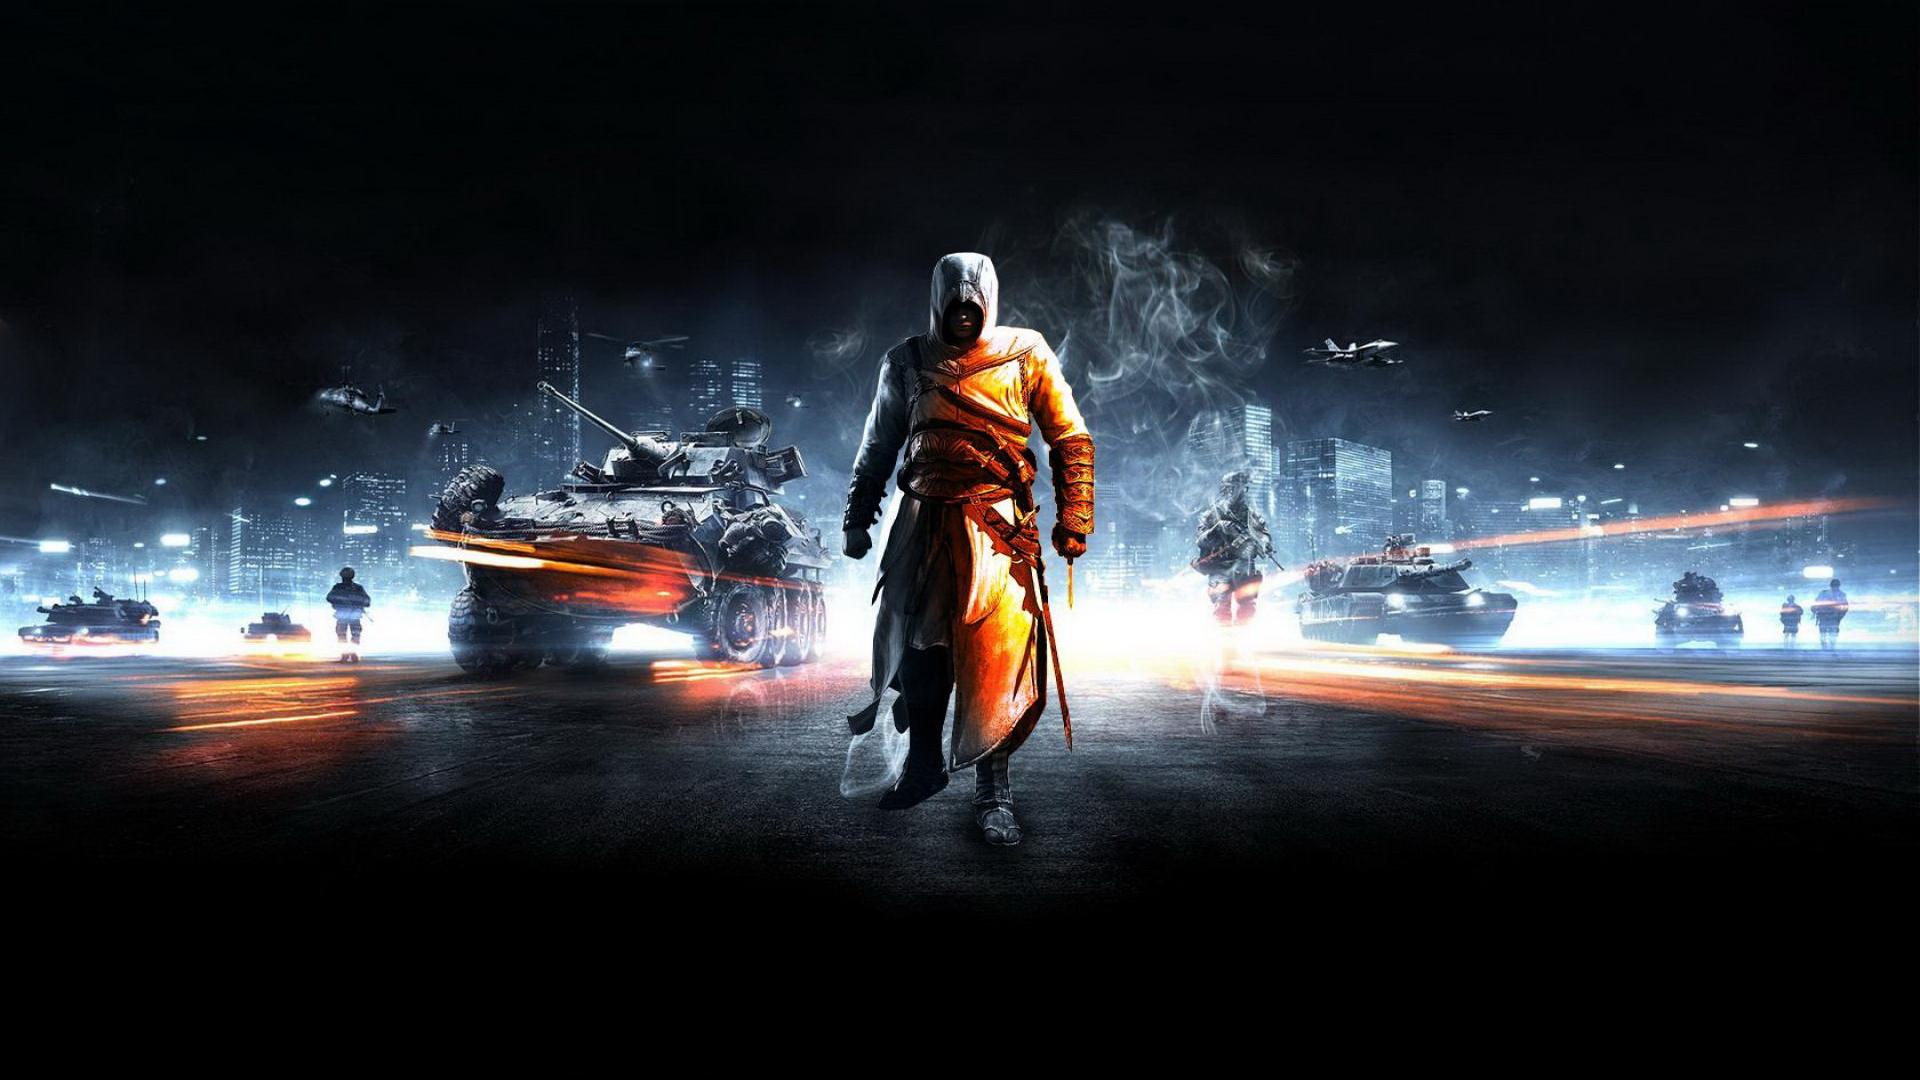 Altair Battlefield 3 Assassins Creed 3 Wallpapers HD Wallpapers 1920x1080